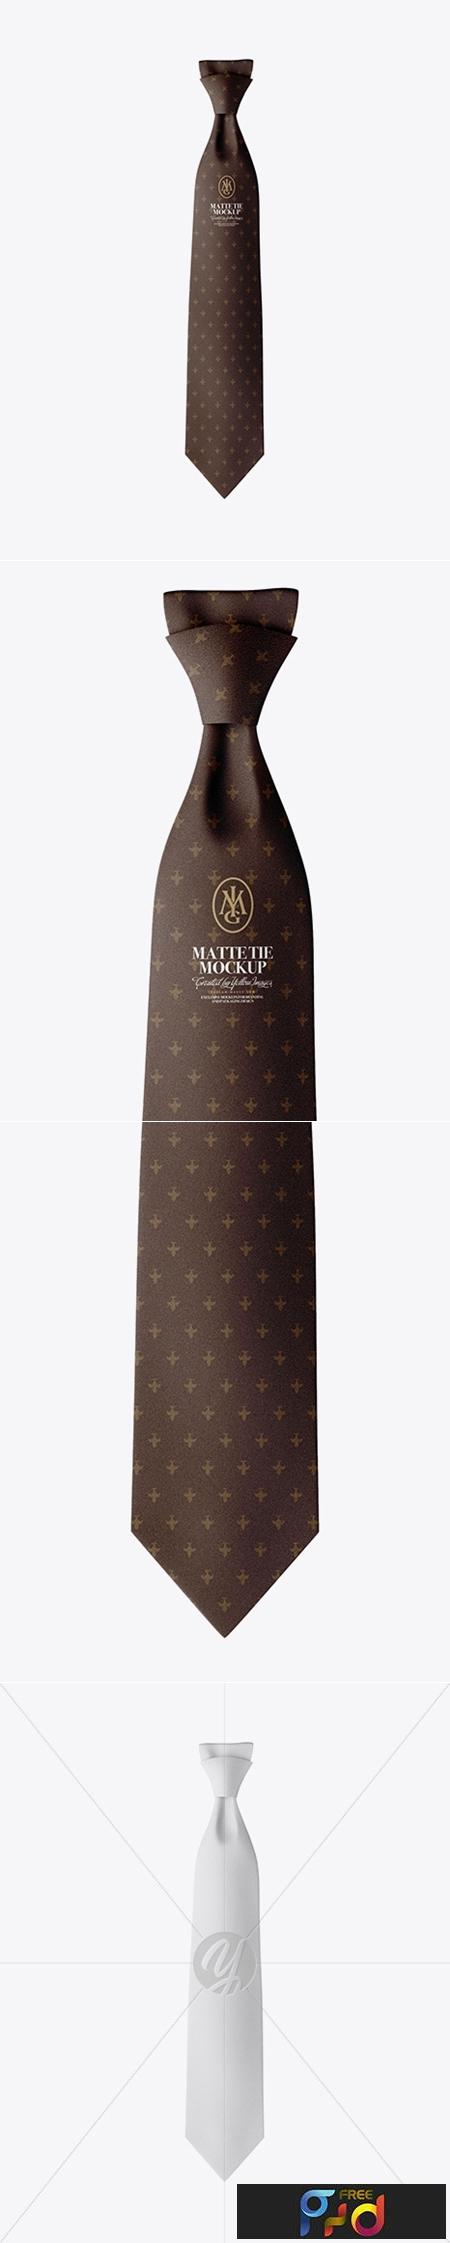 Matte Tie Mockup - Front View 24596 1